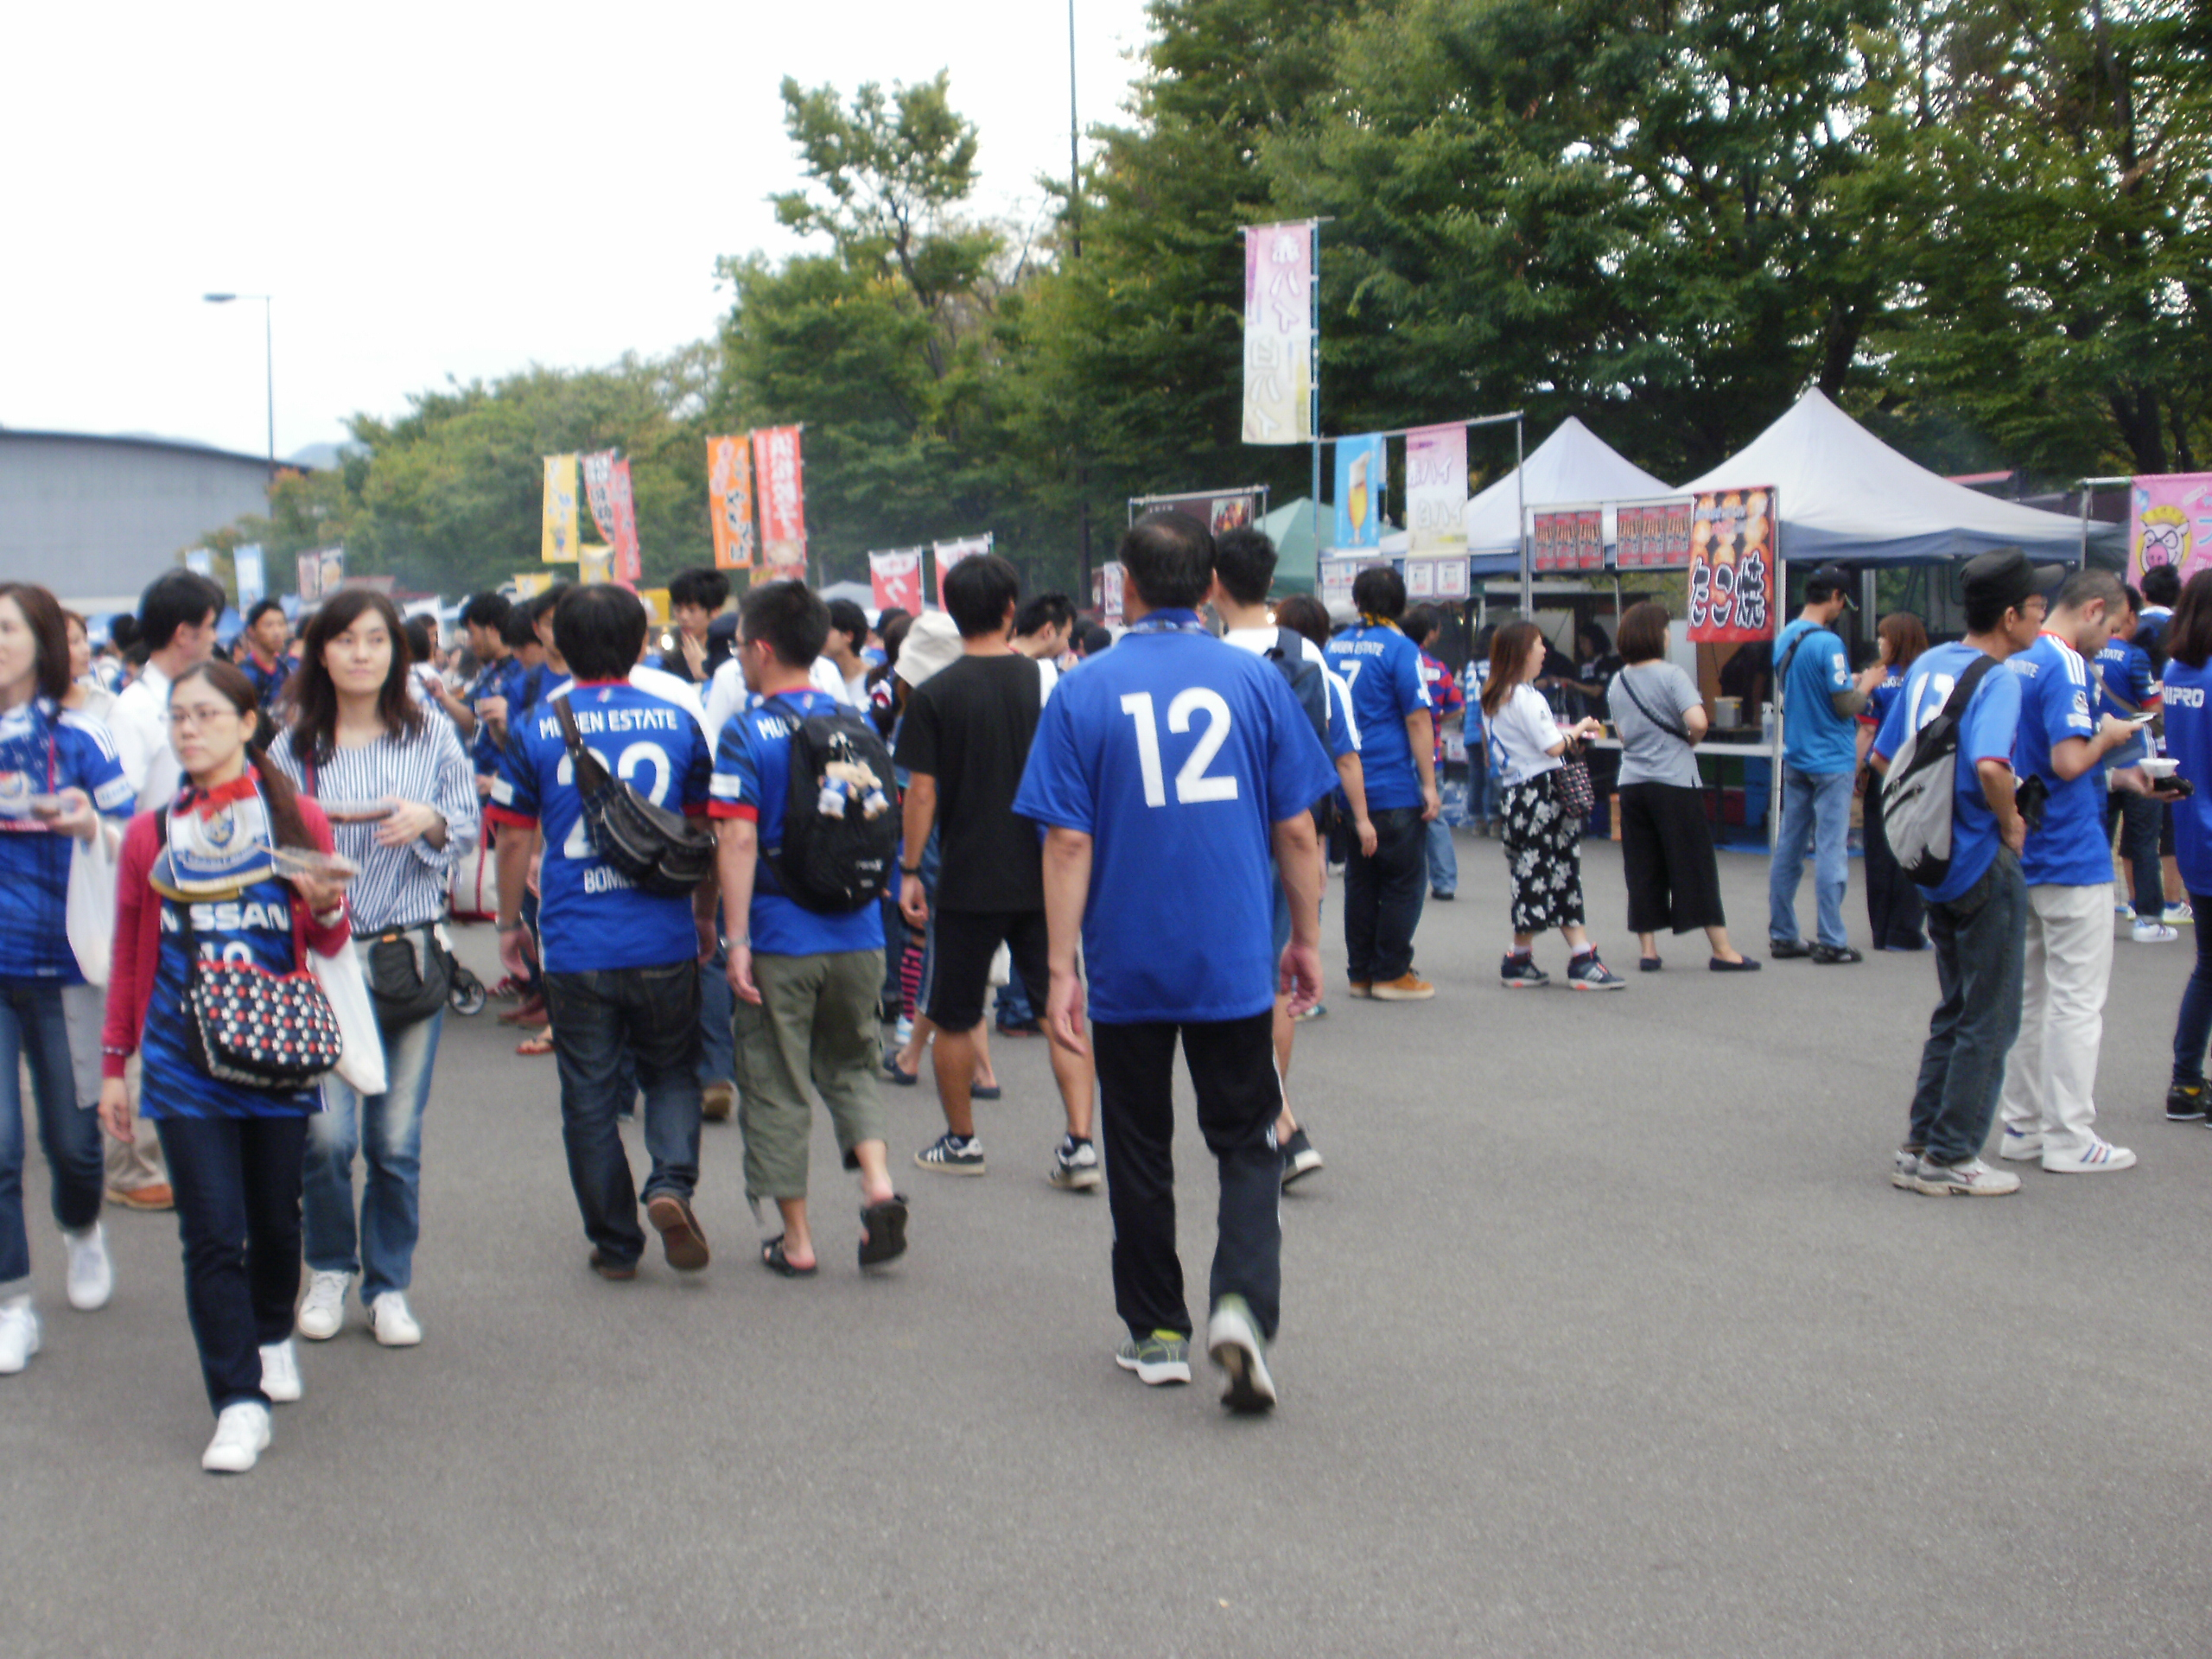 http://www.yamanashi-kankou.jp/blog/%E3%83%95%E3%83%BC%E3%83%89%E3%82%A8%E3%83%AA%E3%82%A2%E2%91%A0.JPG